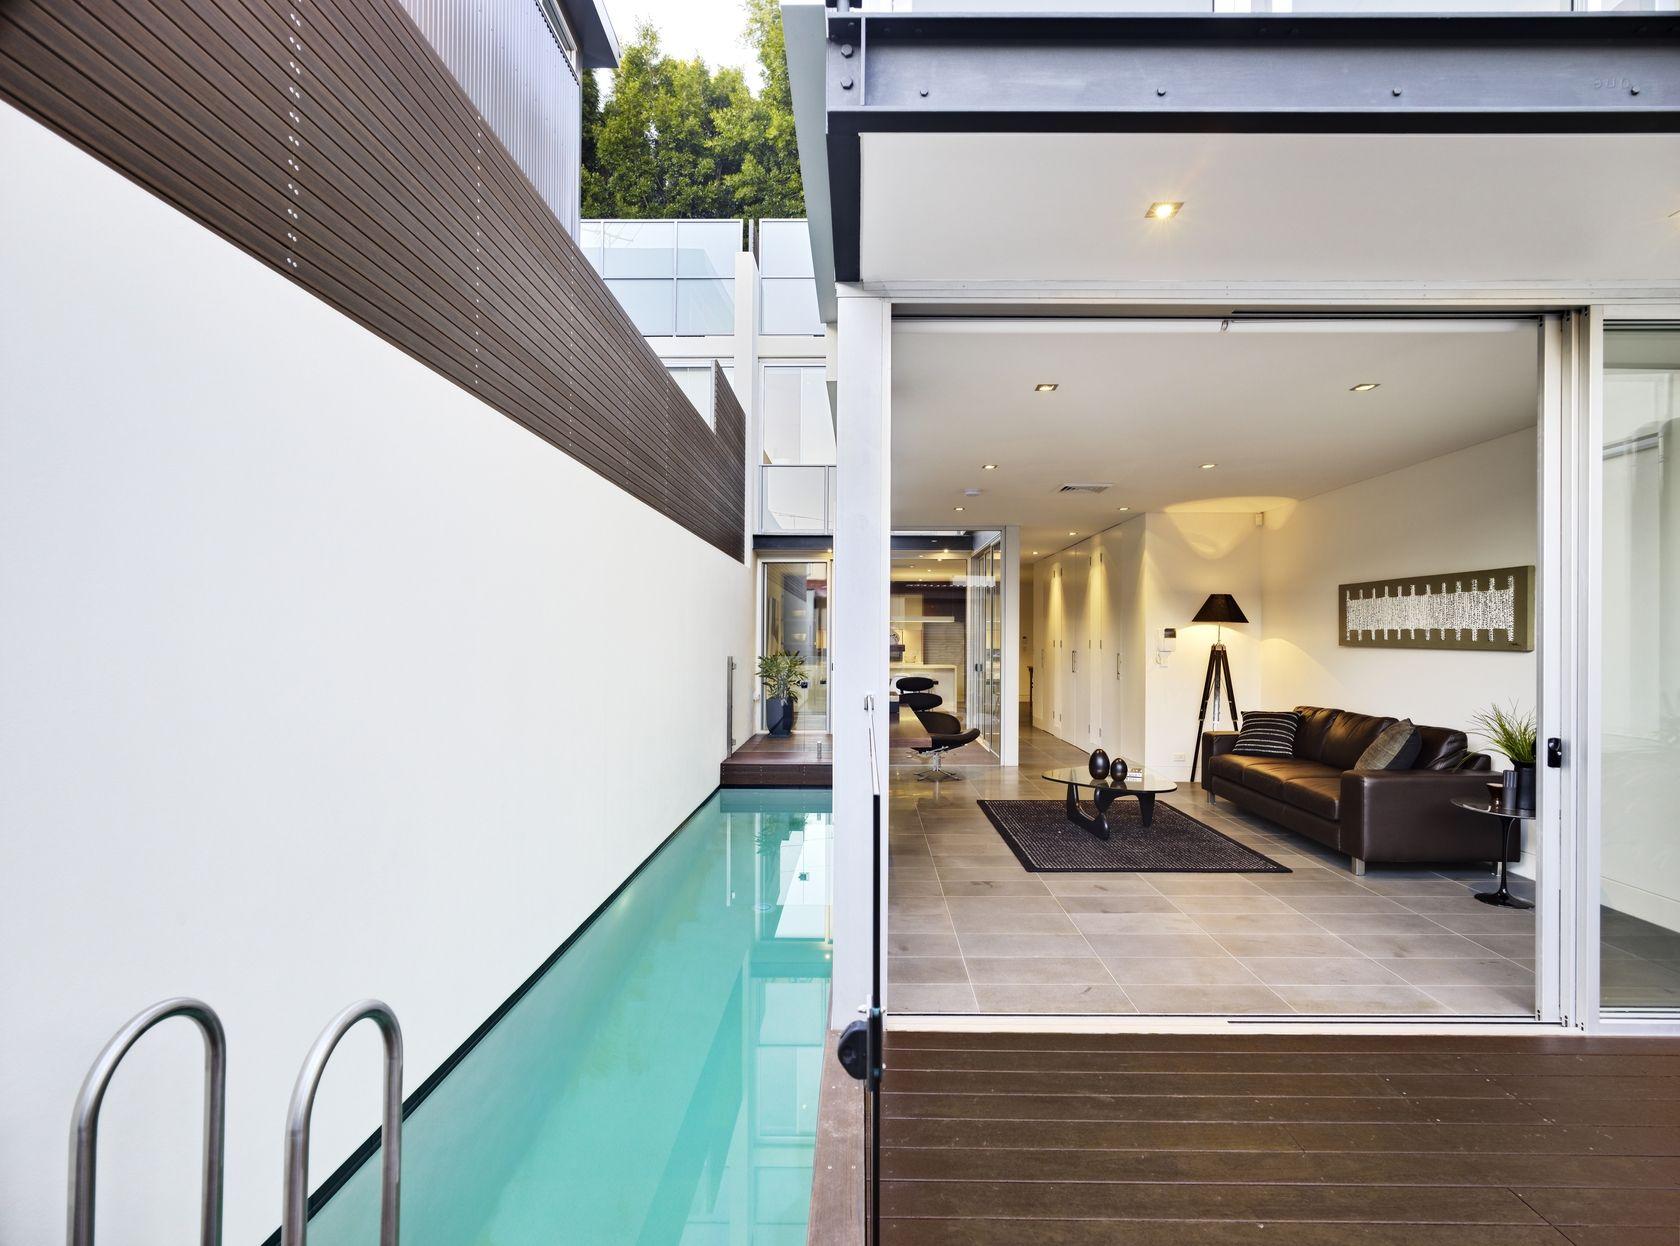 super skinny lap pool dream home in 2019 pool house designs rh pinterest com